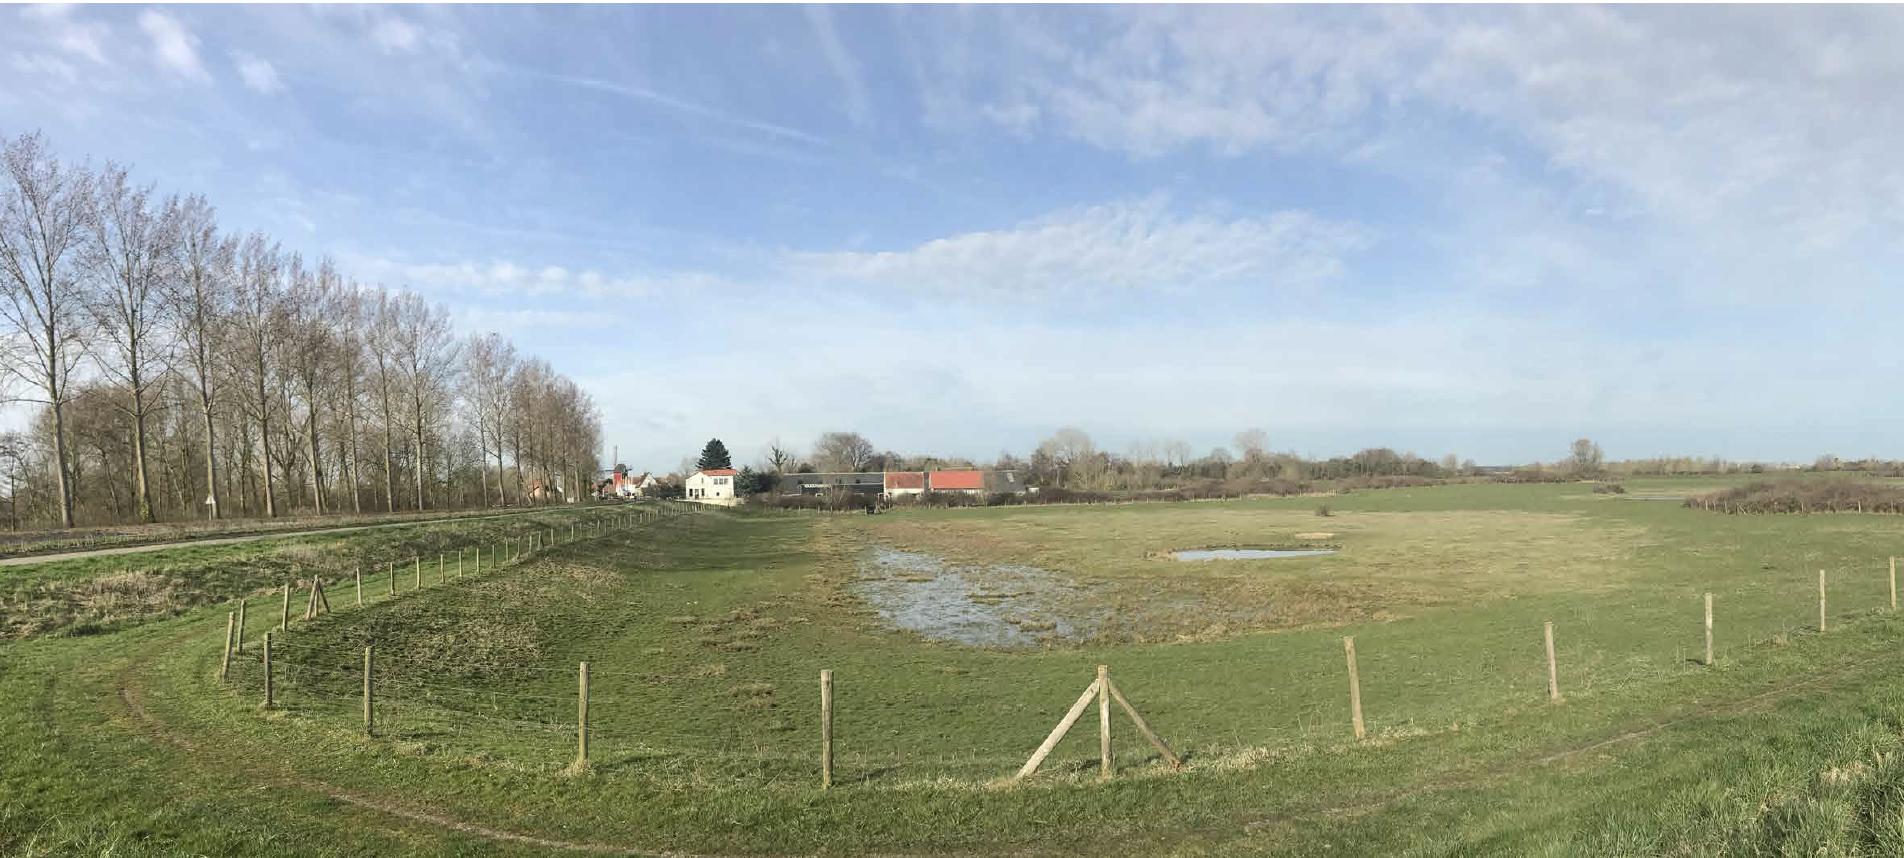 POLDER RESERVE - Retranchement, Netherlands